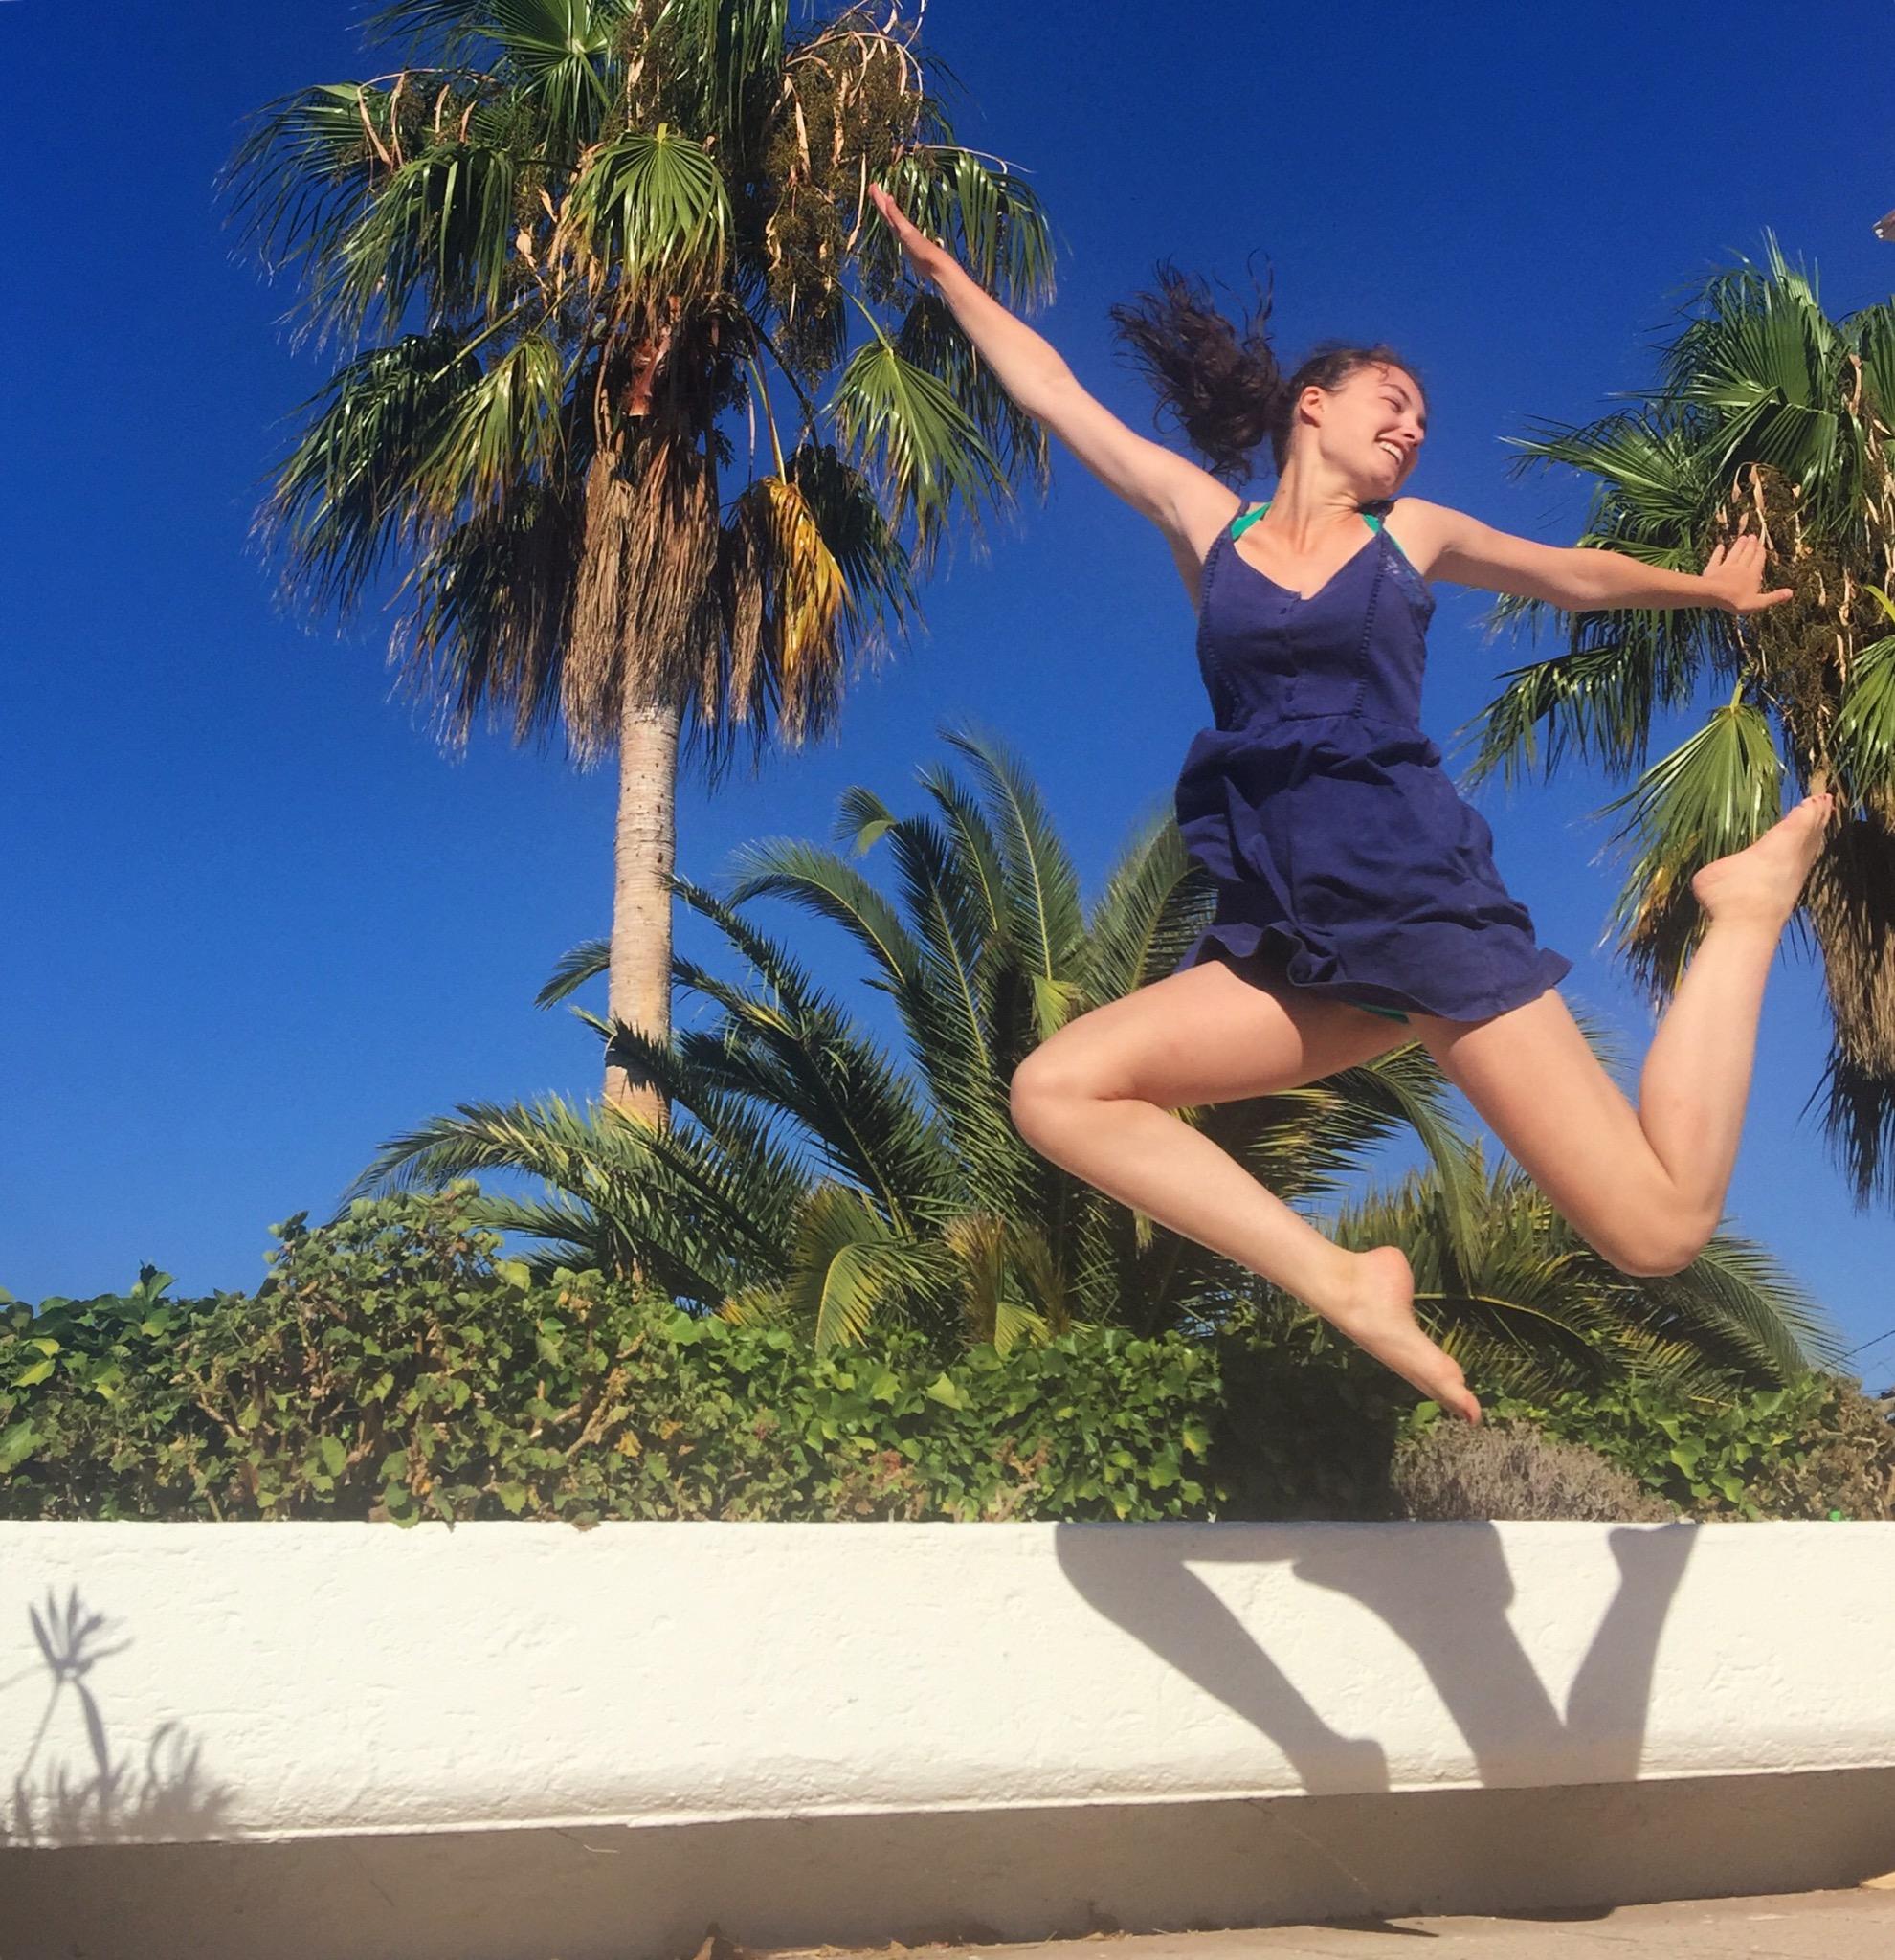 Bobbi Summer Jump